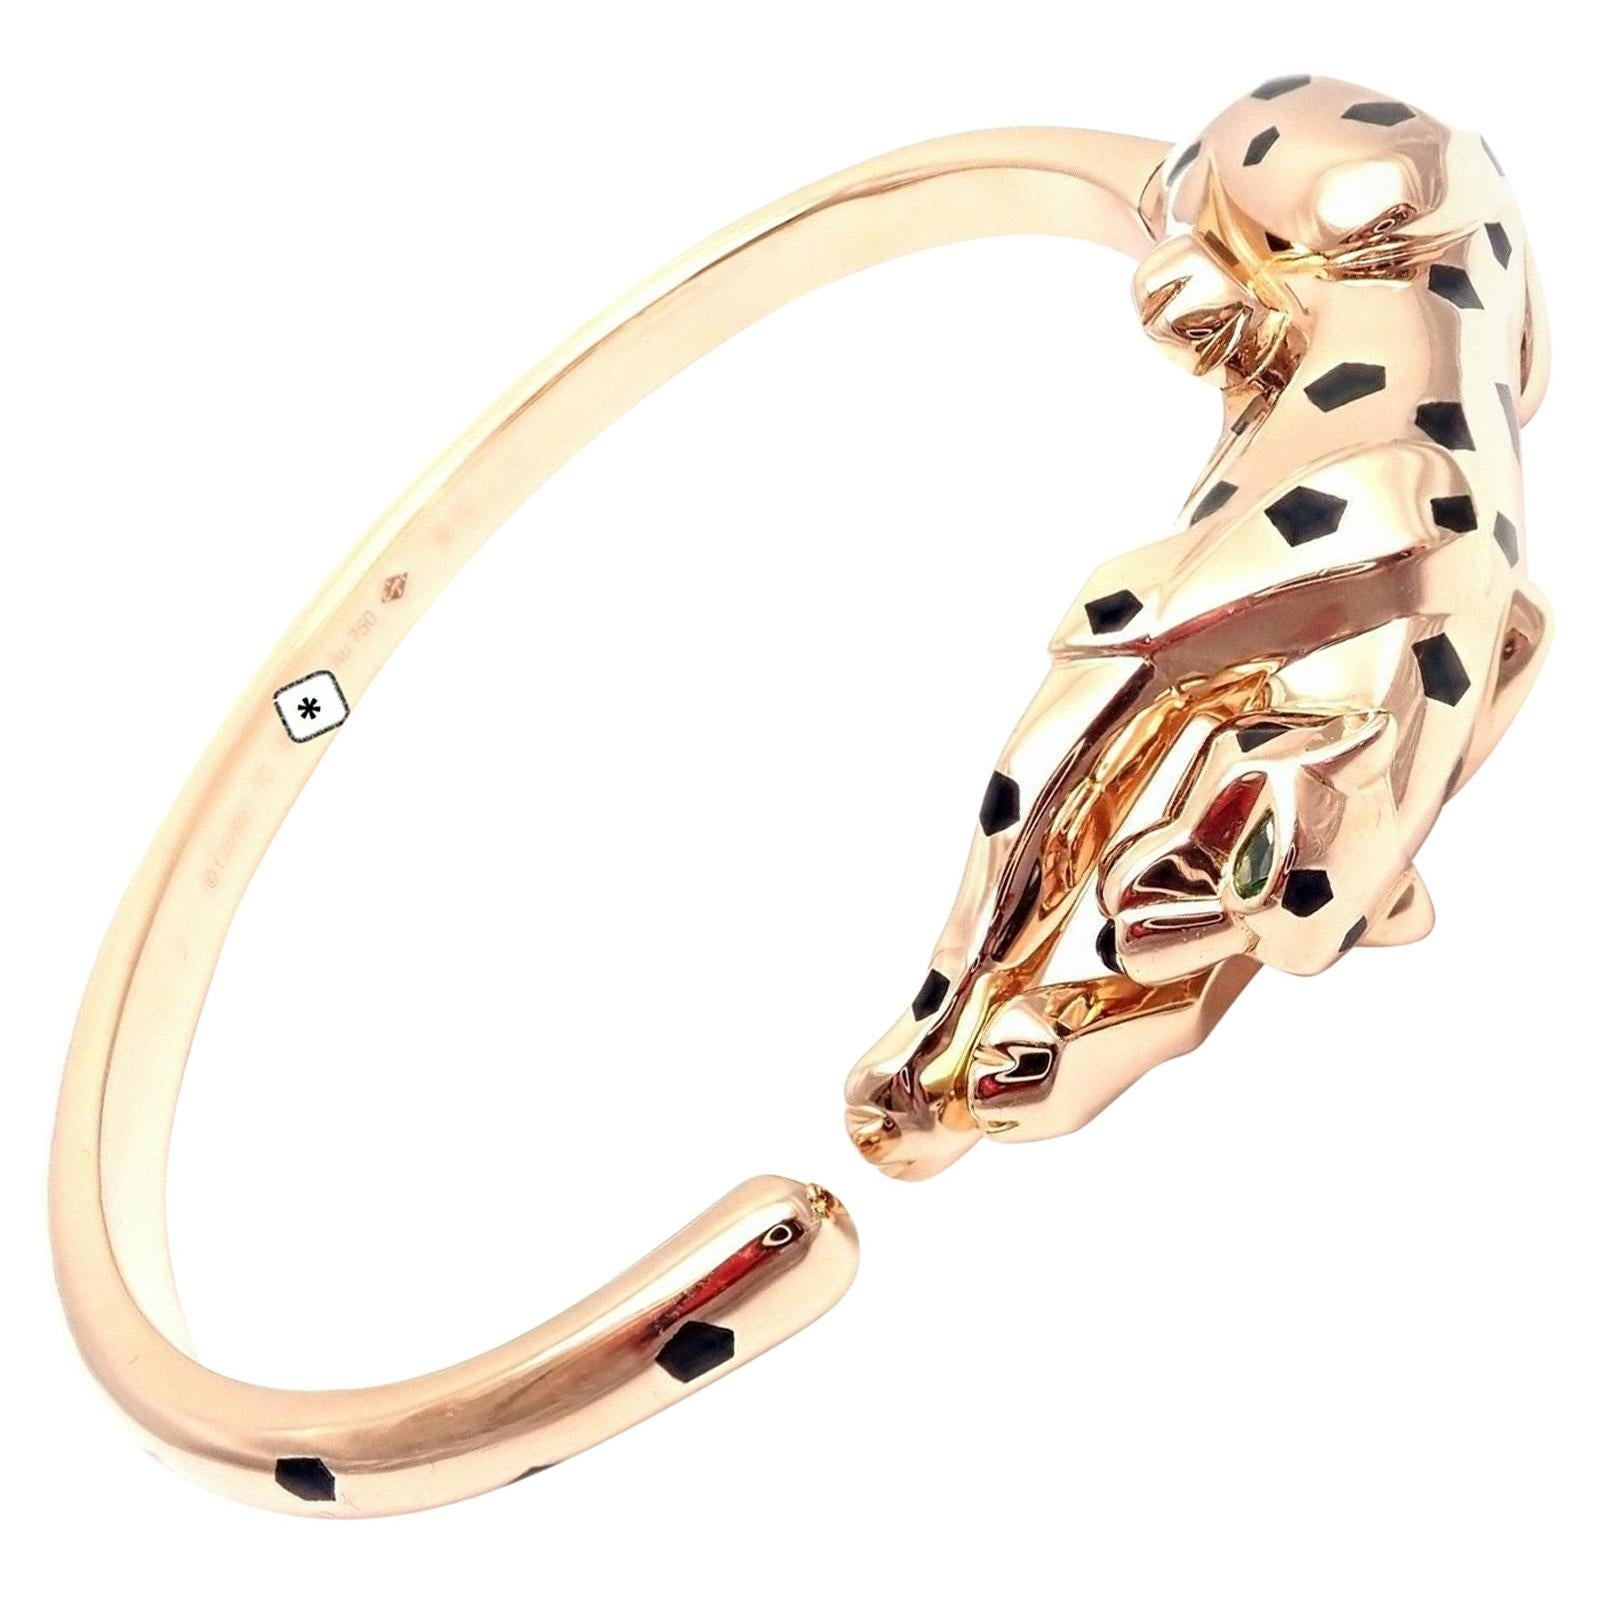 Cartier Panther Panthere Onyx Tsavorite Black Lacquer Rose Gold Bangle Bracelet